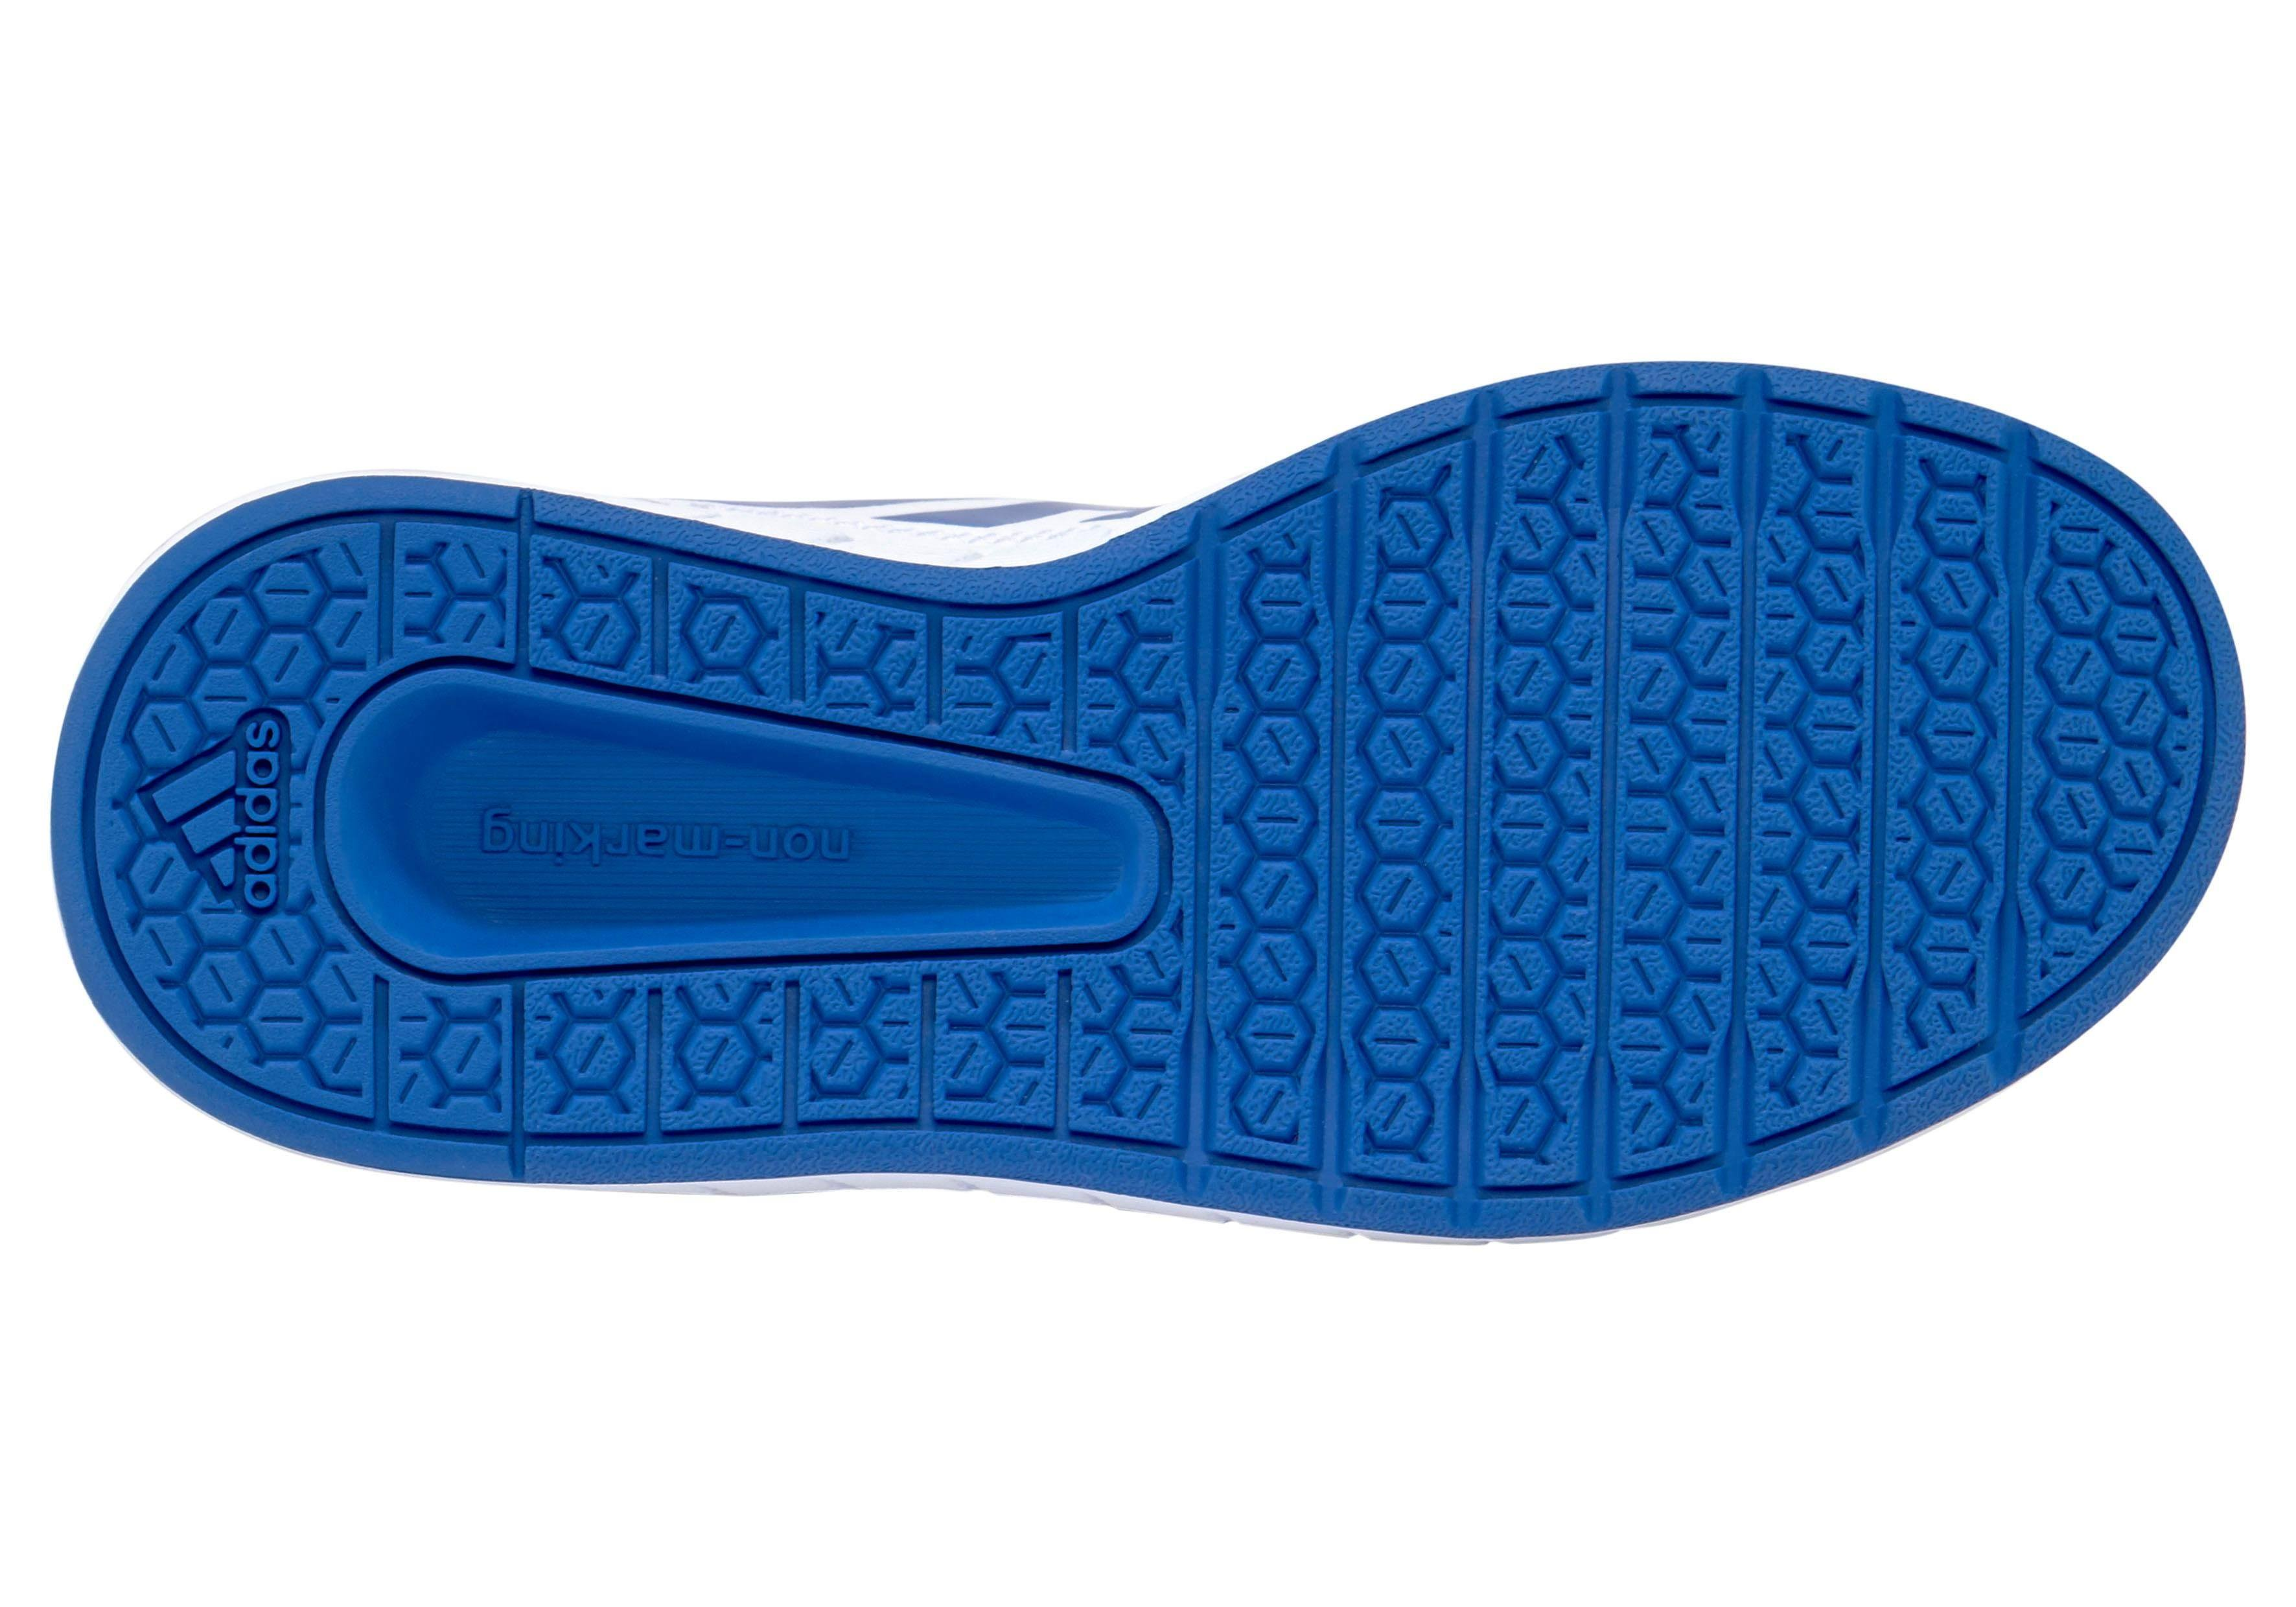 Kinder D96869 blue weiß Altasport Ftwwht K Turnschuhe Adidas blue 38 AqwIxdA7O